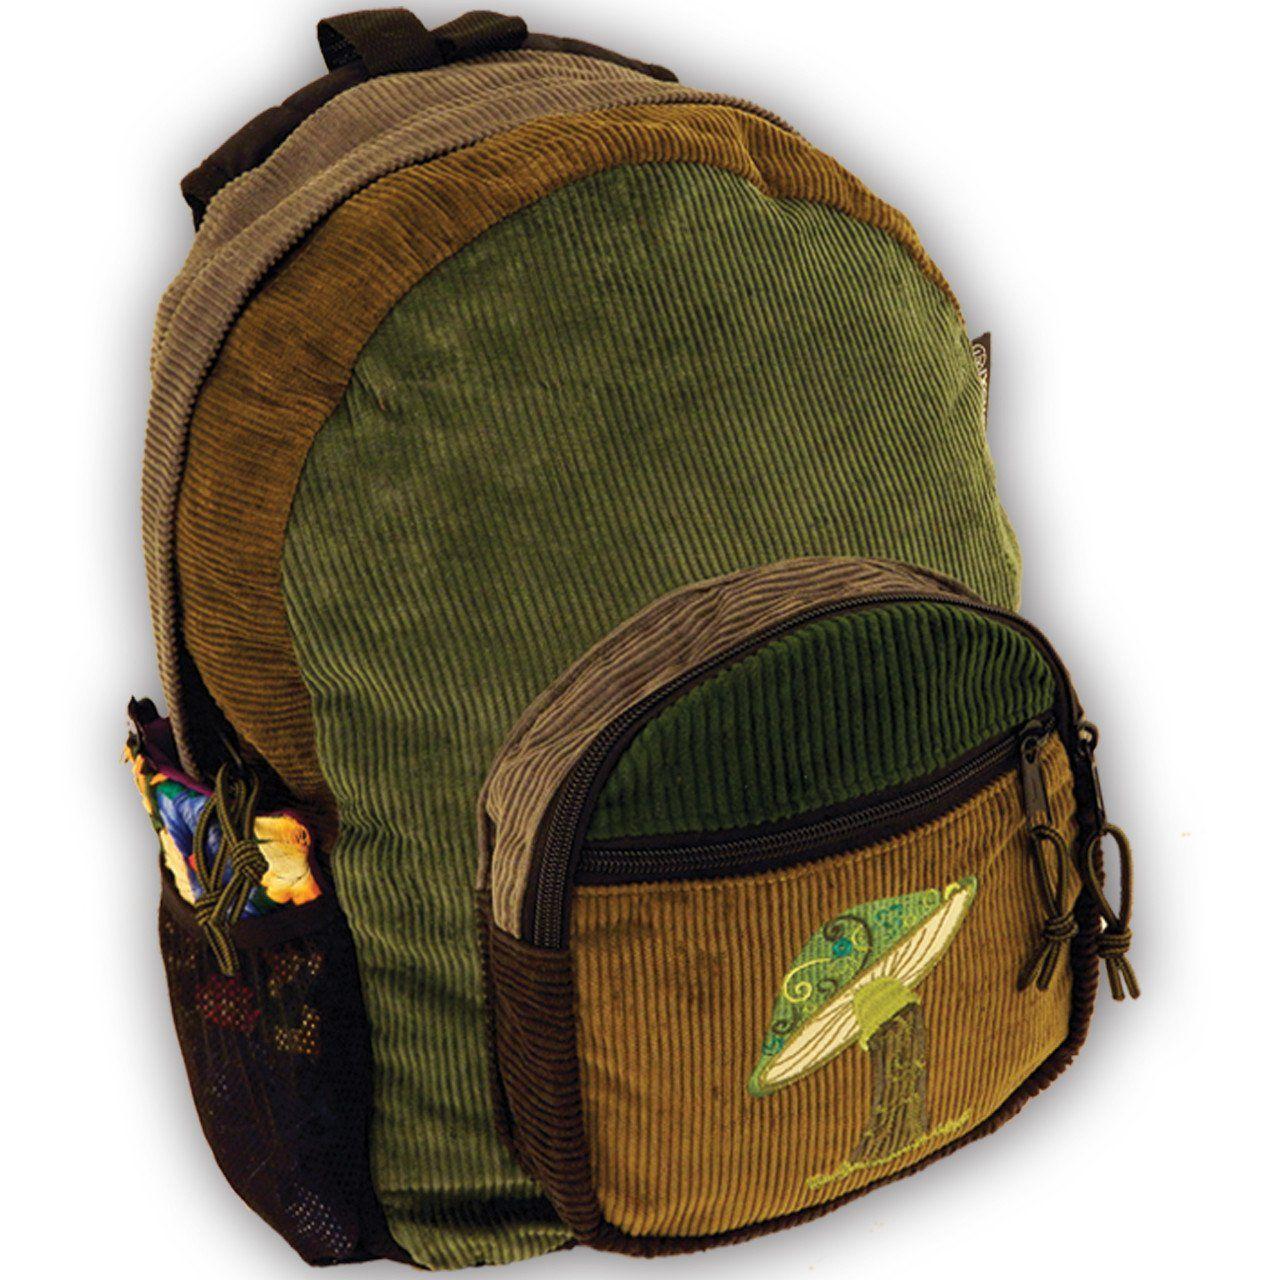 Corduroy Backpack With Mushroom Embroidery Medium In